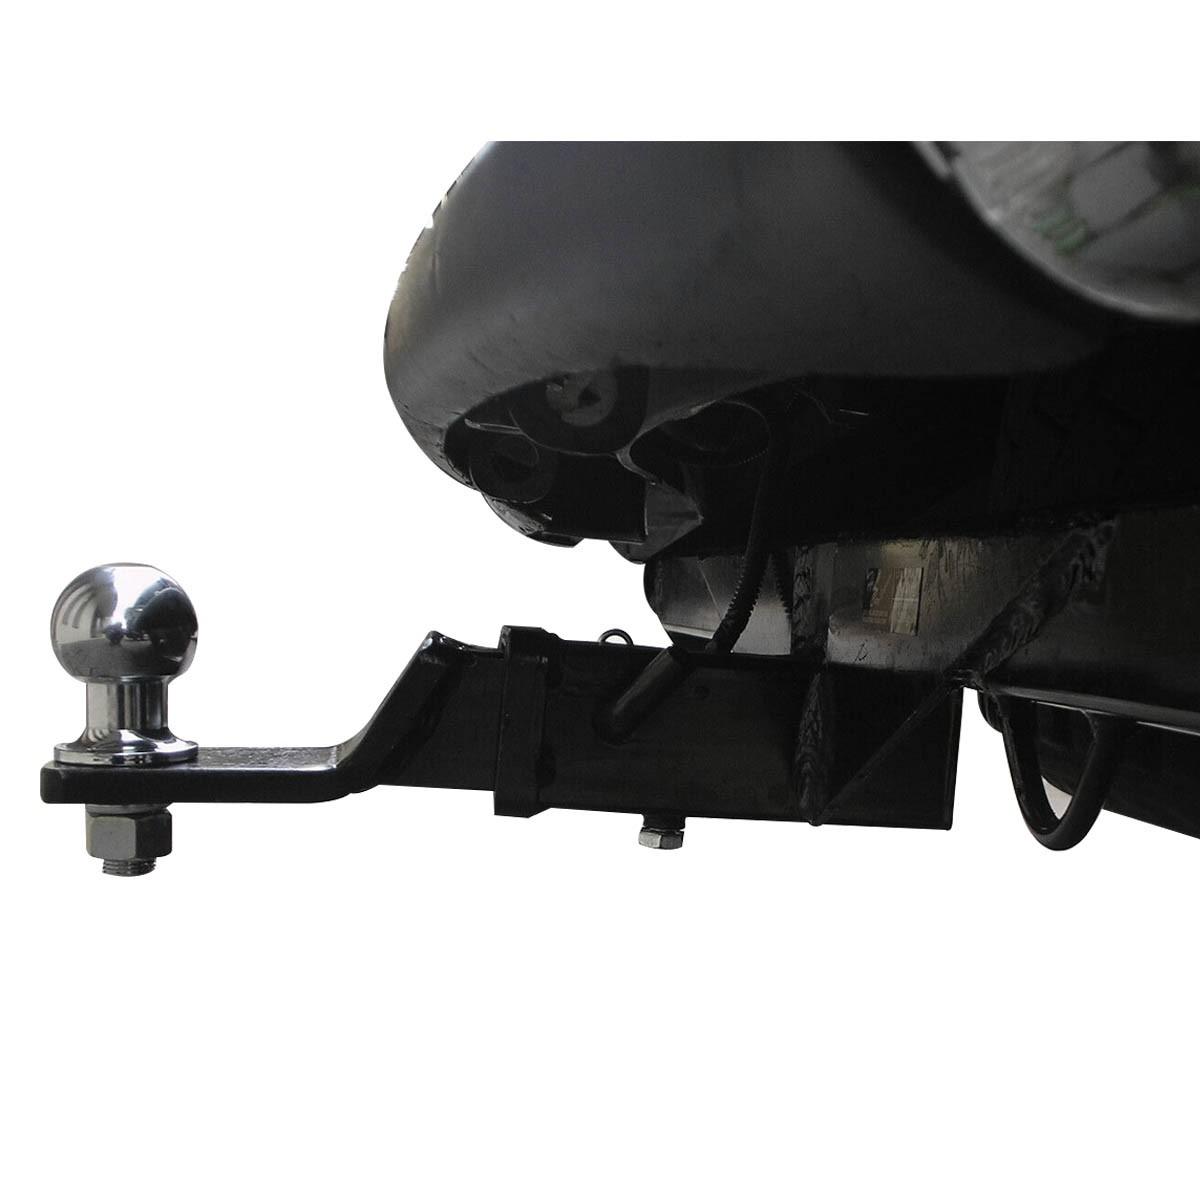 Engate de reboque removível F250 1998 a 2011